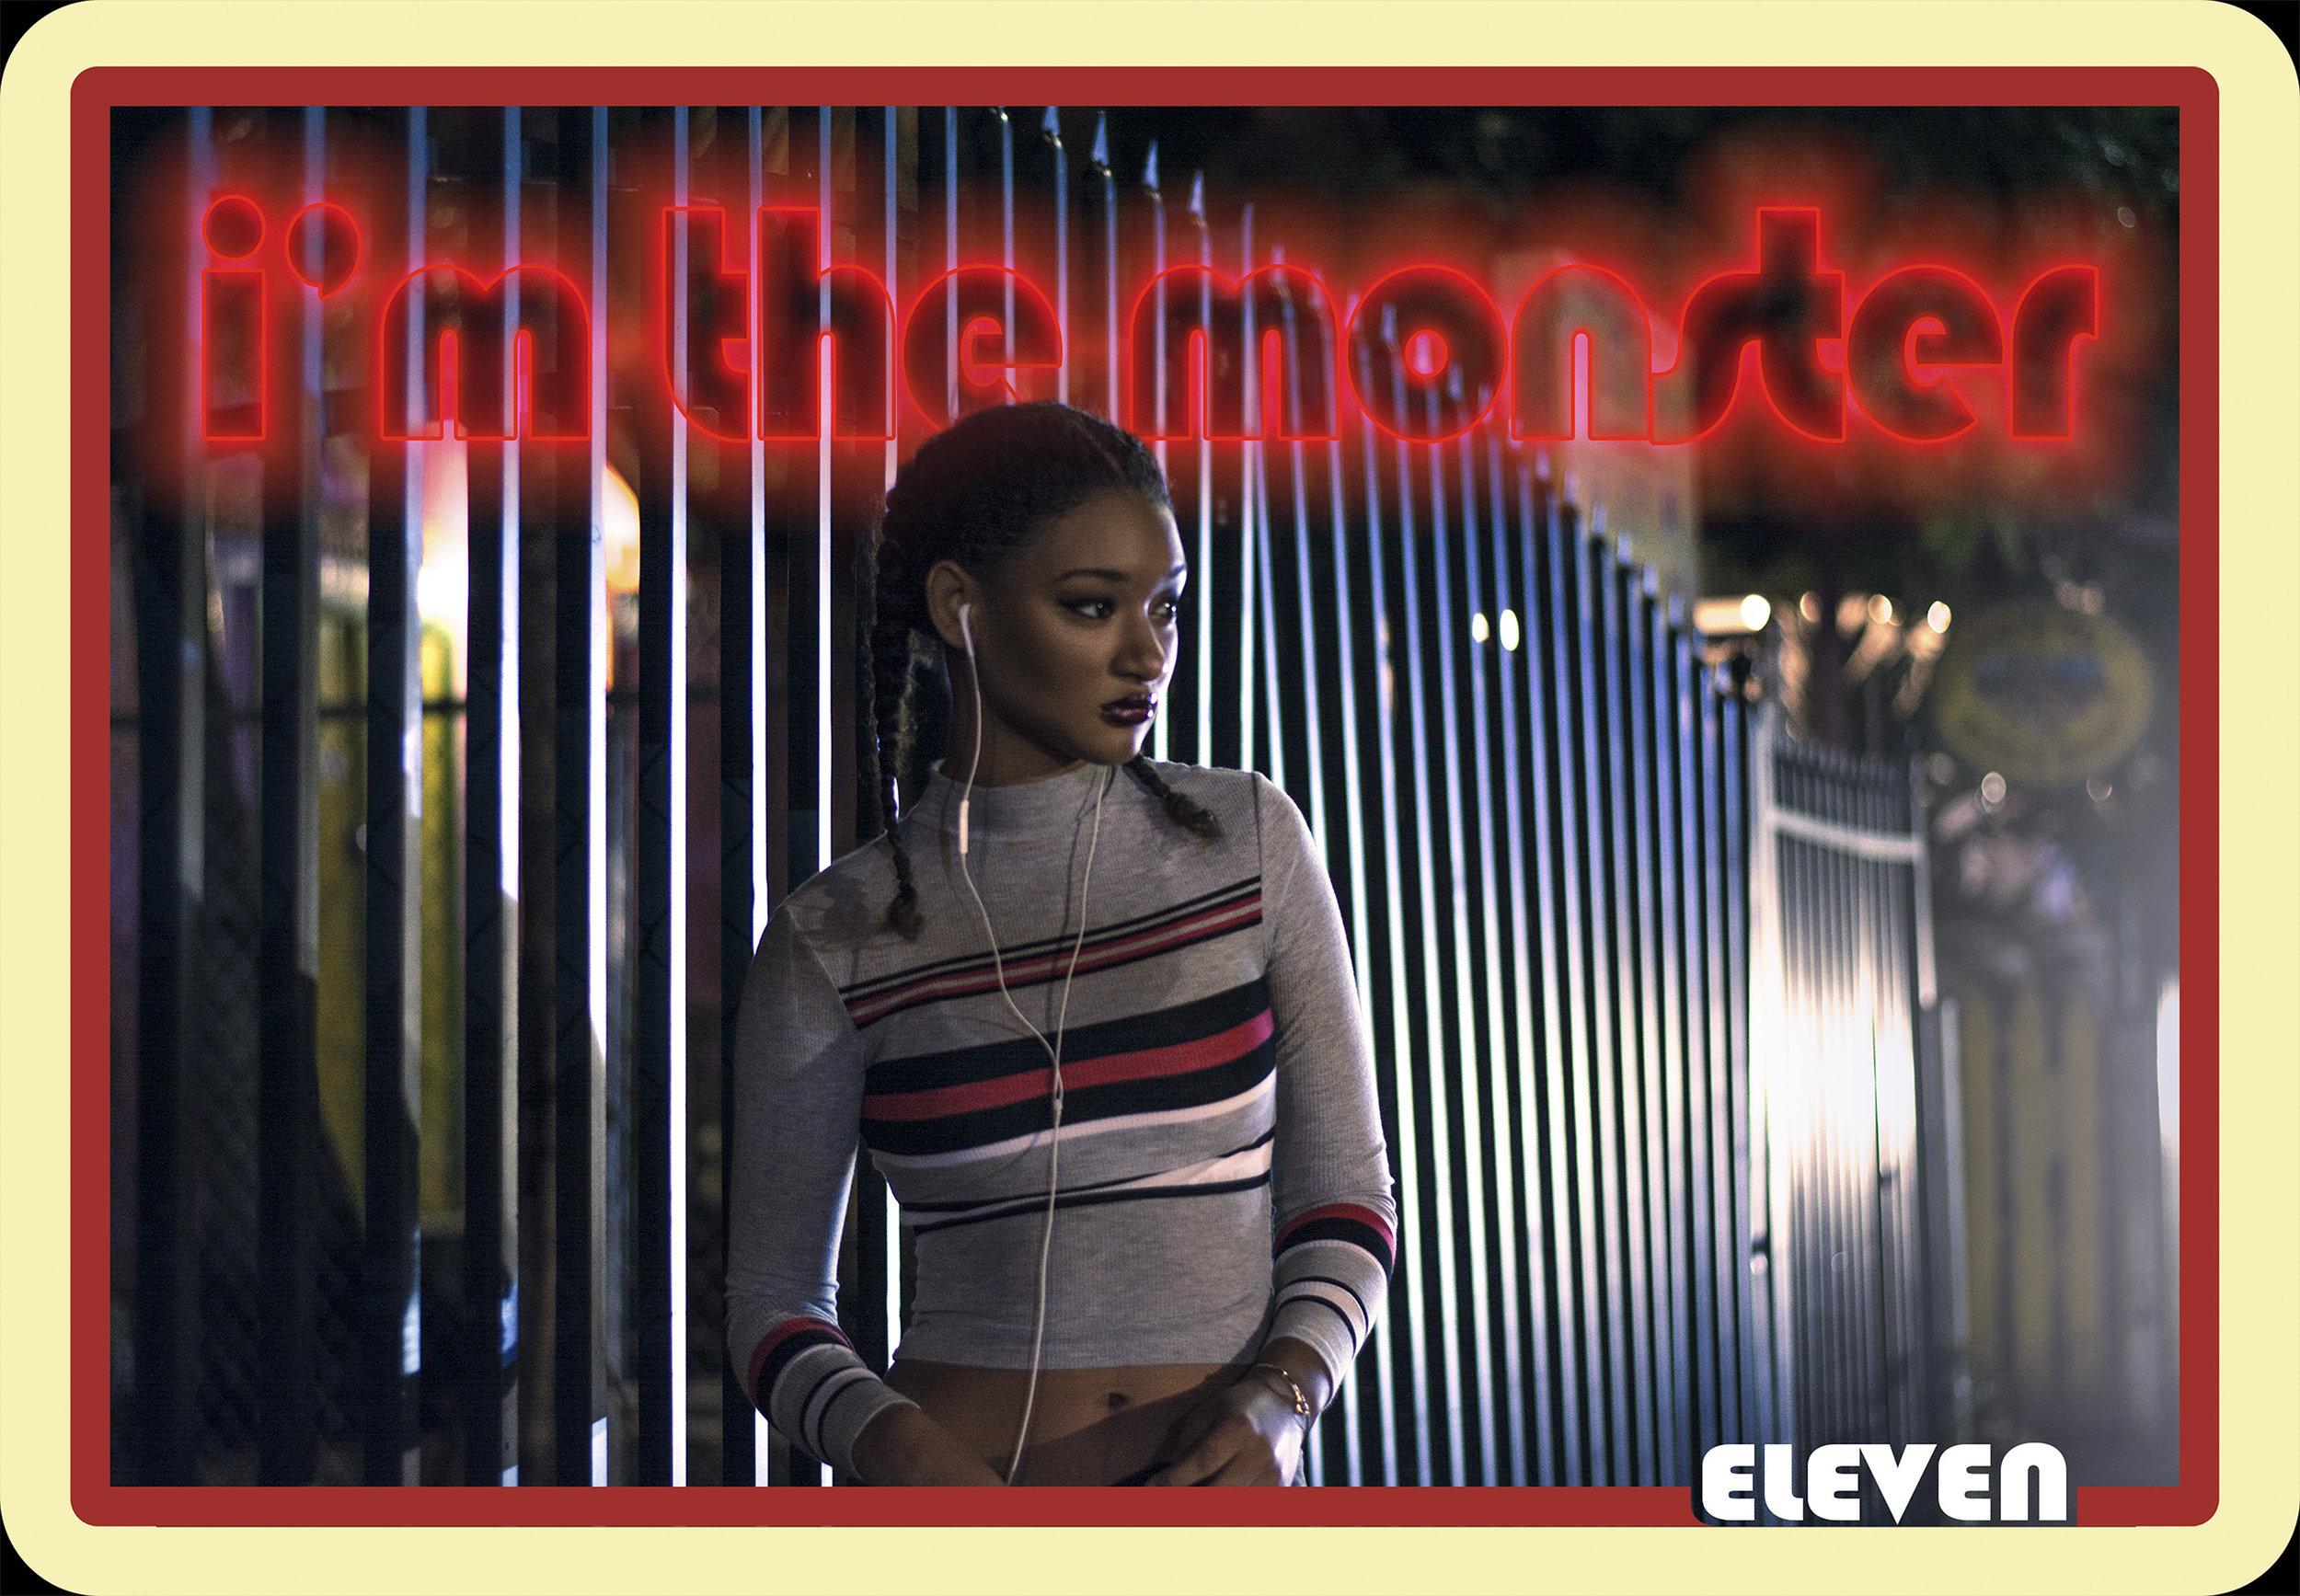 strangerthings_eleven_teen_fashion_mixed_islandgirl_model_braid_jeanjacket_neon_04.jpg